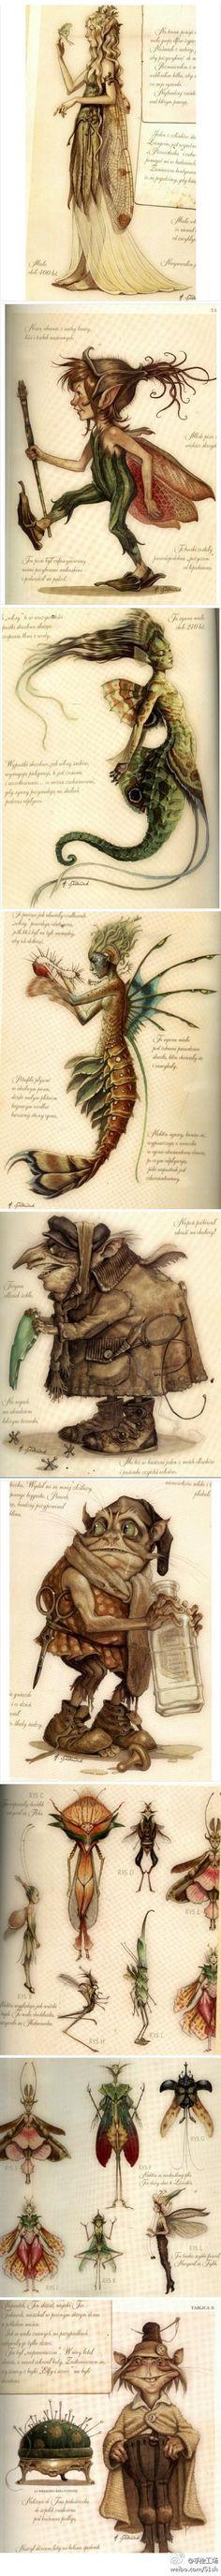 Goblins - spiderwick